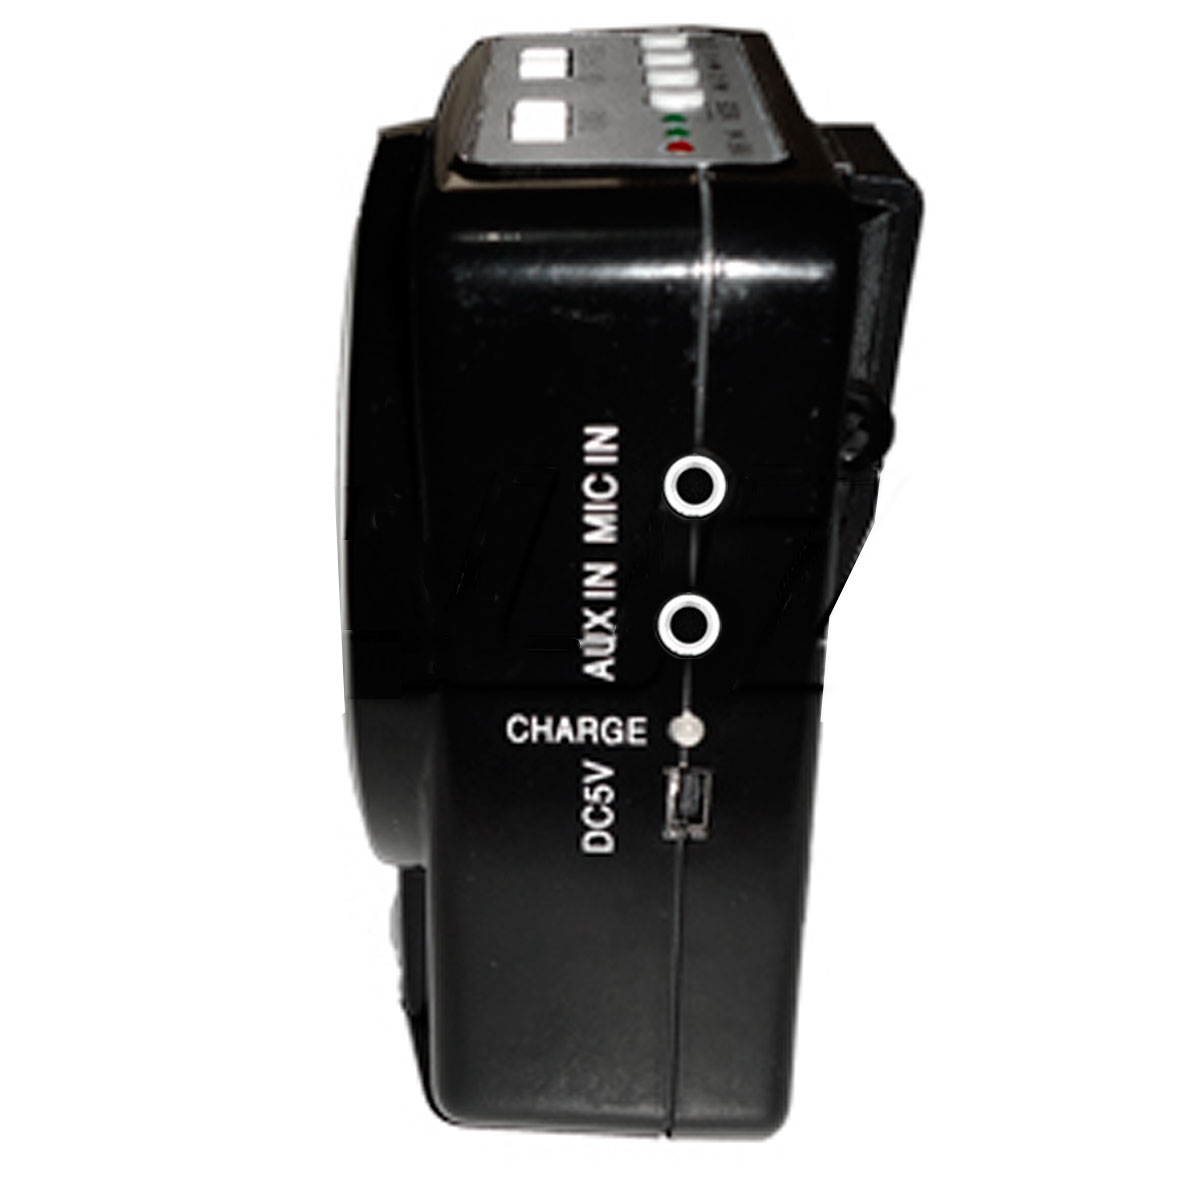 BW700 - Kit Professor Portátil c/ Caixa + Microfone c/ Fio BW 700 - CSR